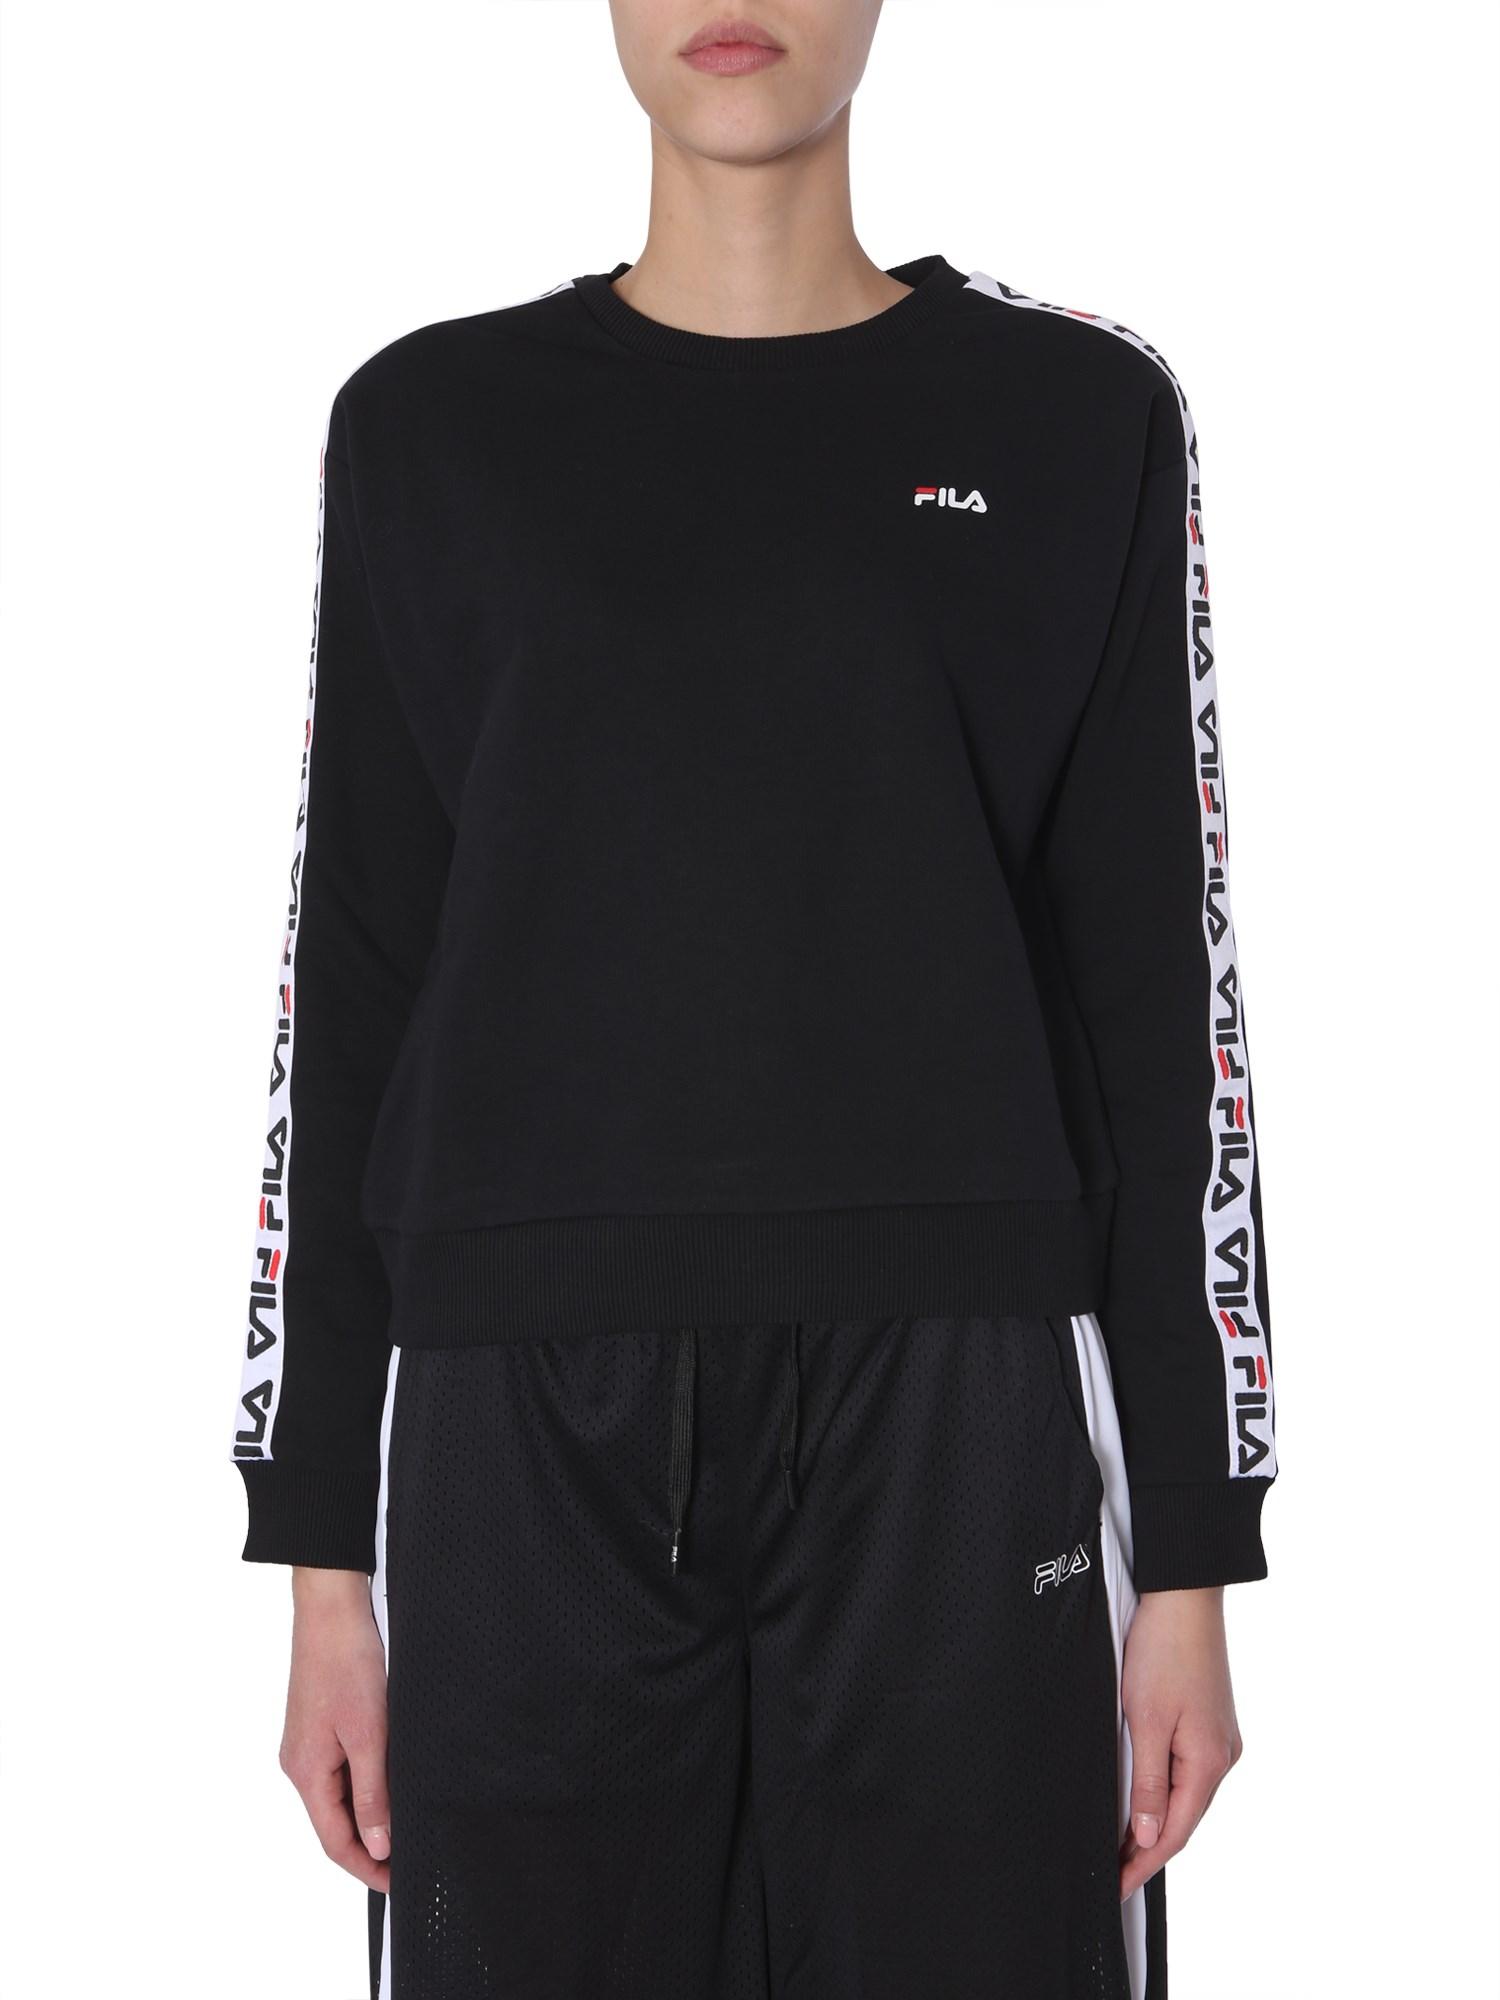 "fila ""tivka"" sweatshirt"